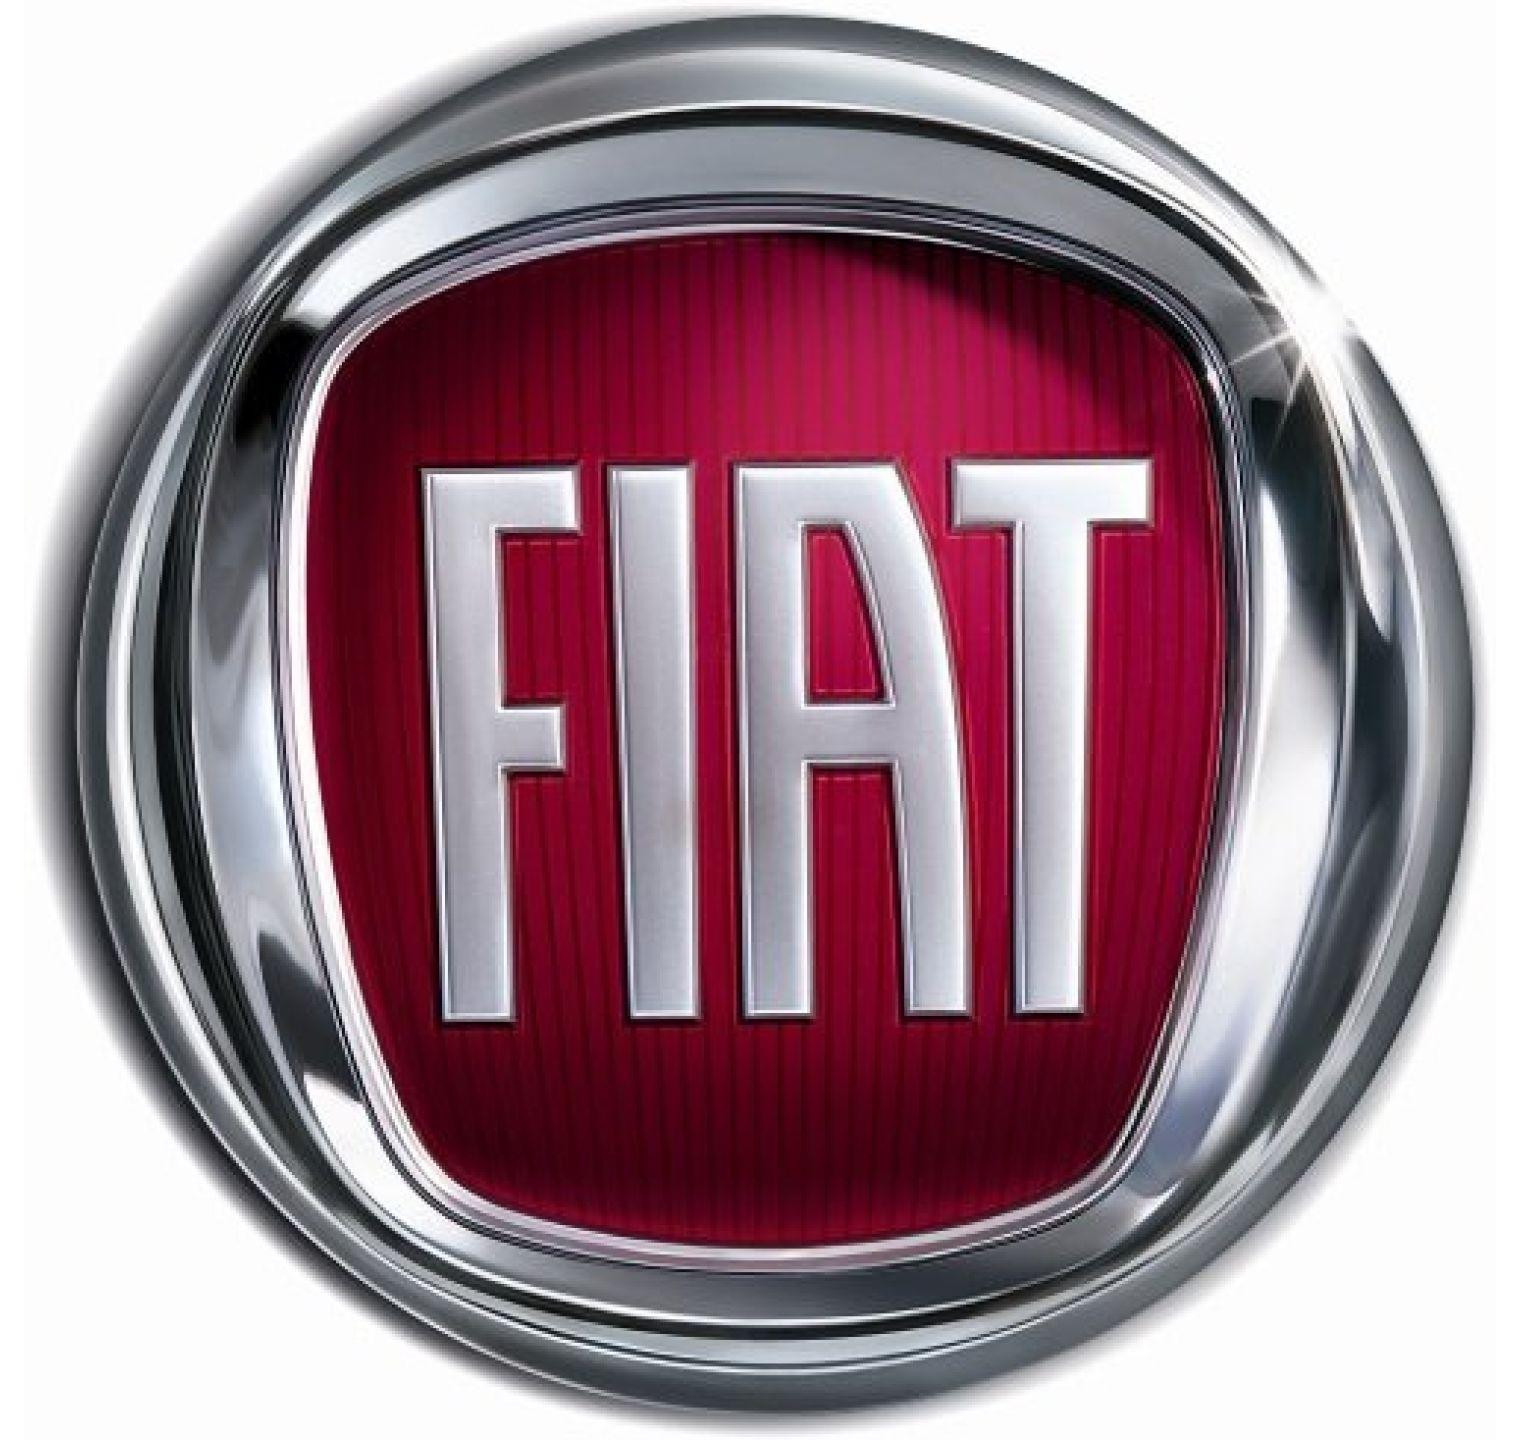 Fiat Barchetta (1995 t/m 2005) - set ruitenwissers Valeo Compact Revolution